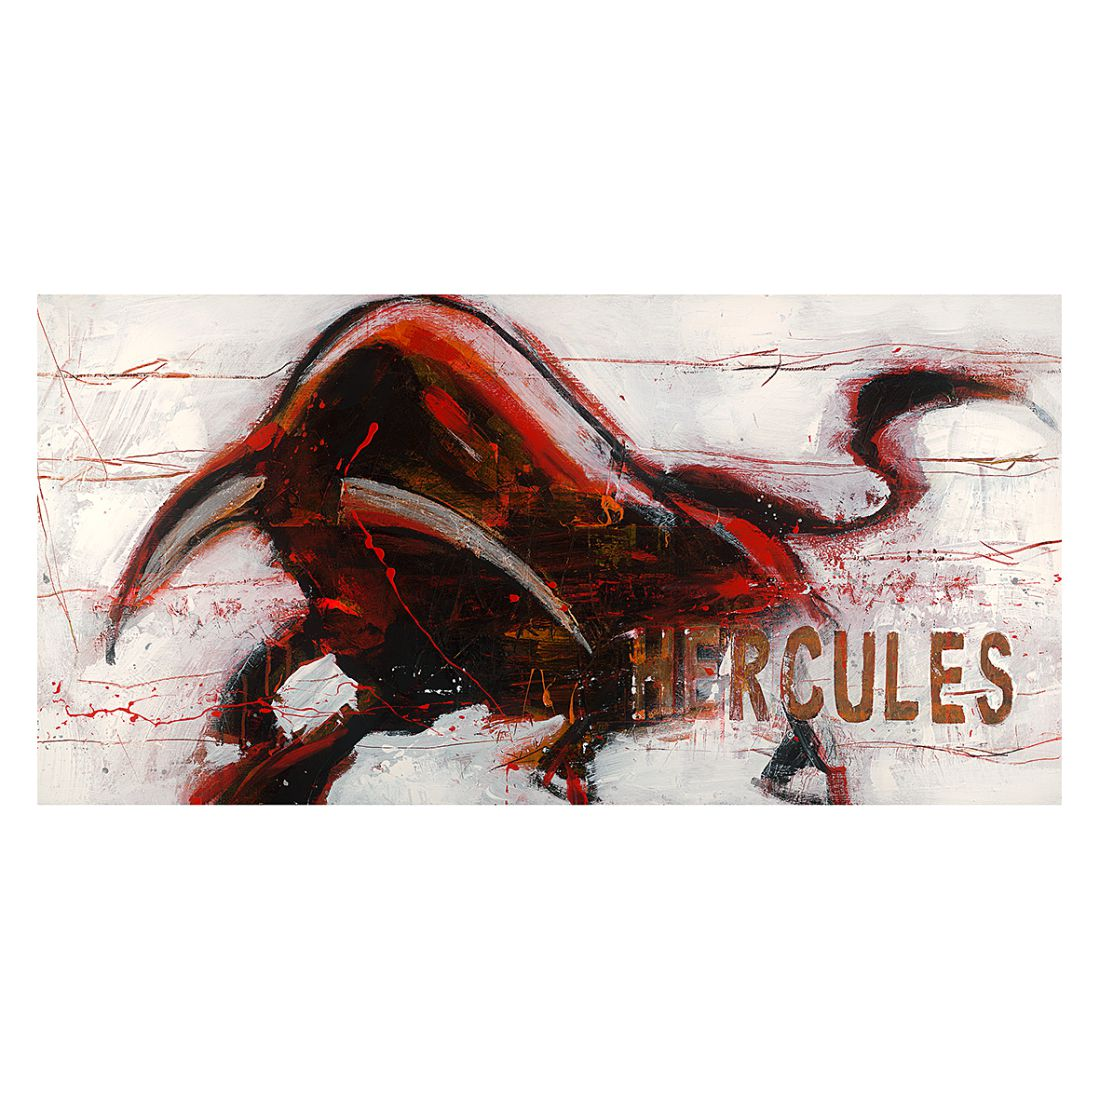 Kunstdruck Hercules 100×50, Pro Art günstig